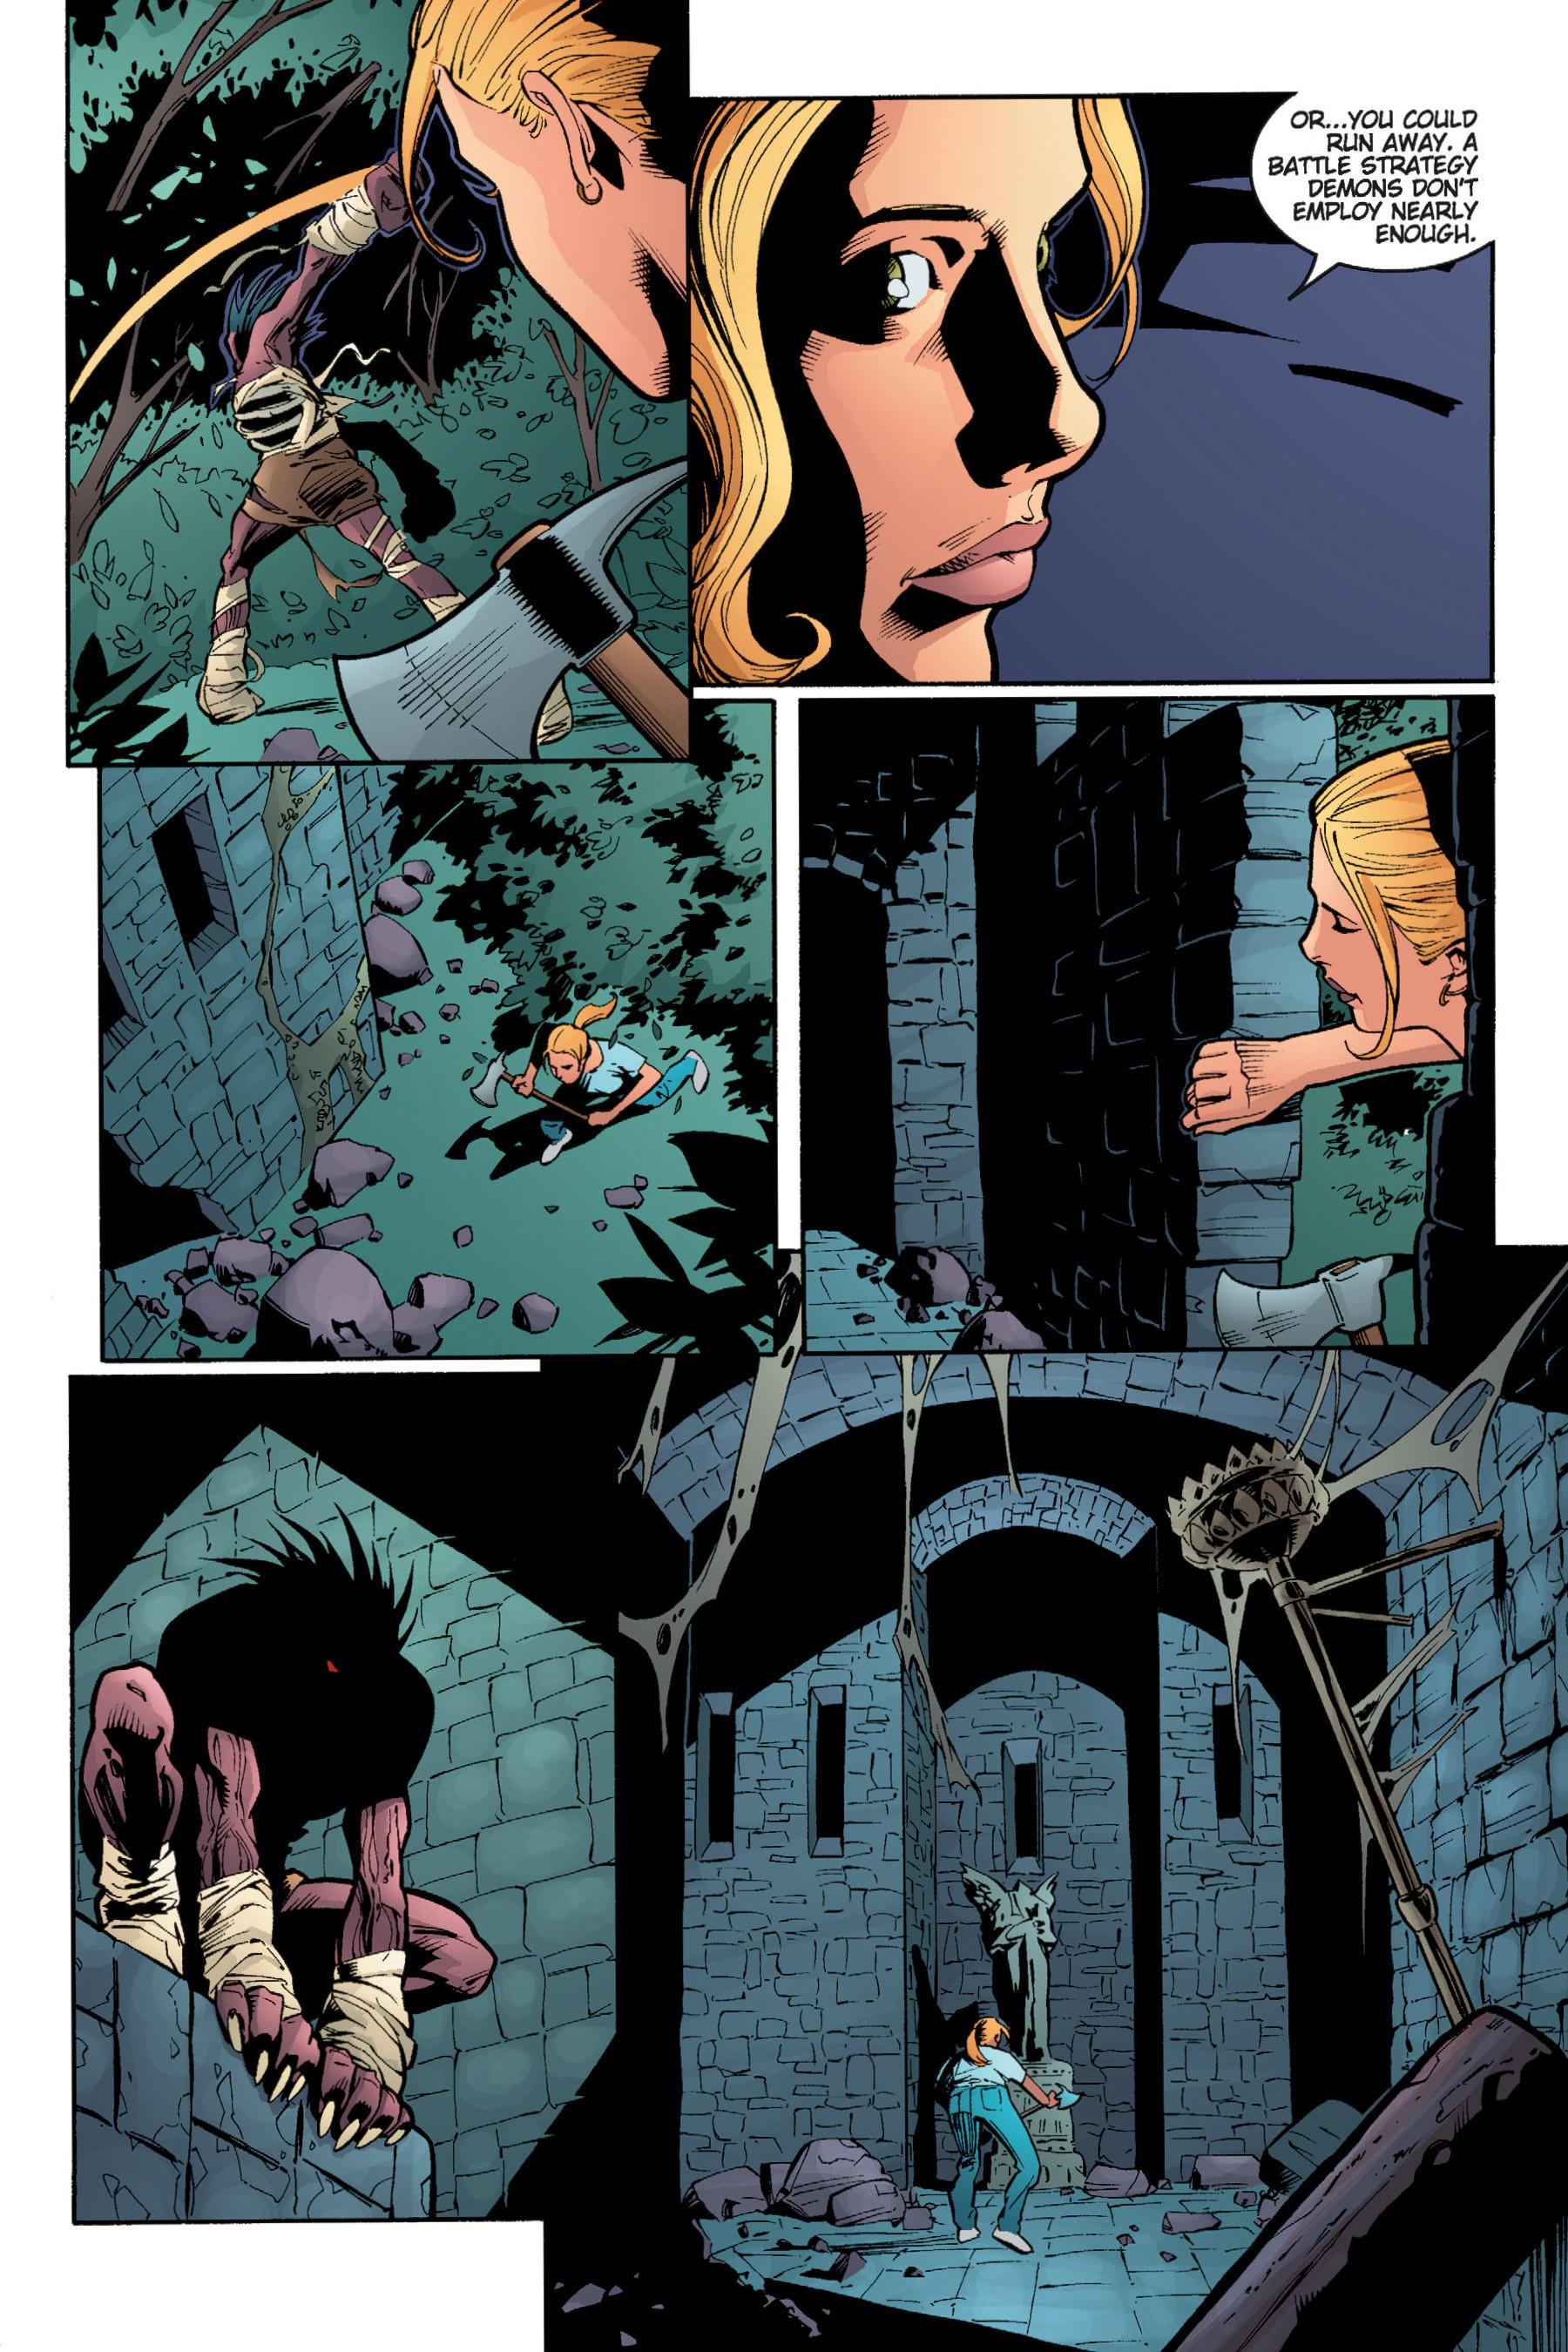 Read online Buffy the Vampire Slayer: Omnibus comic -  Issue # TPB 5 - 136